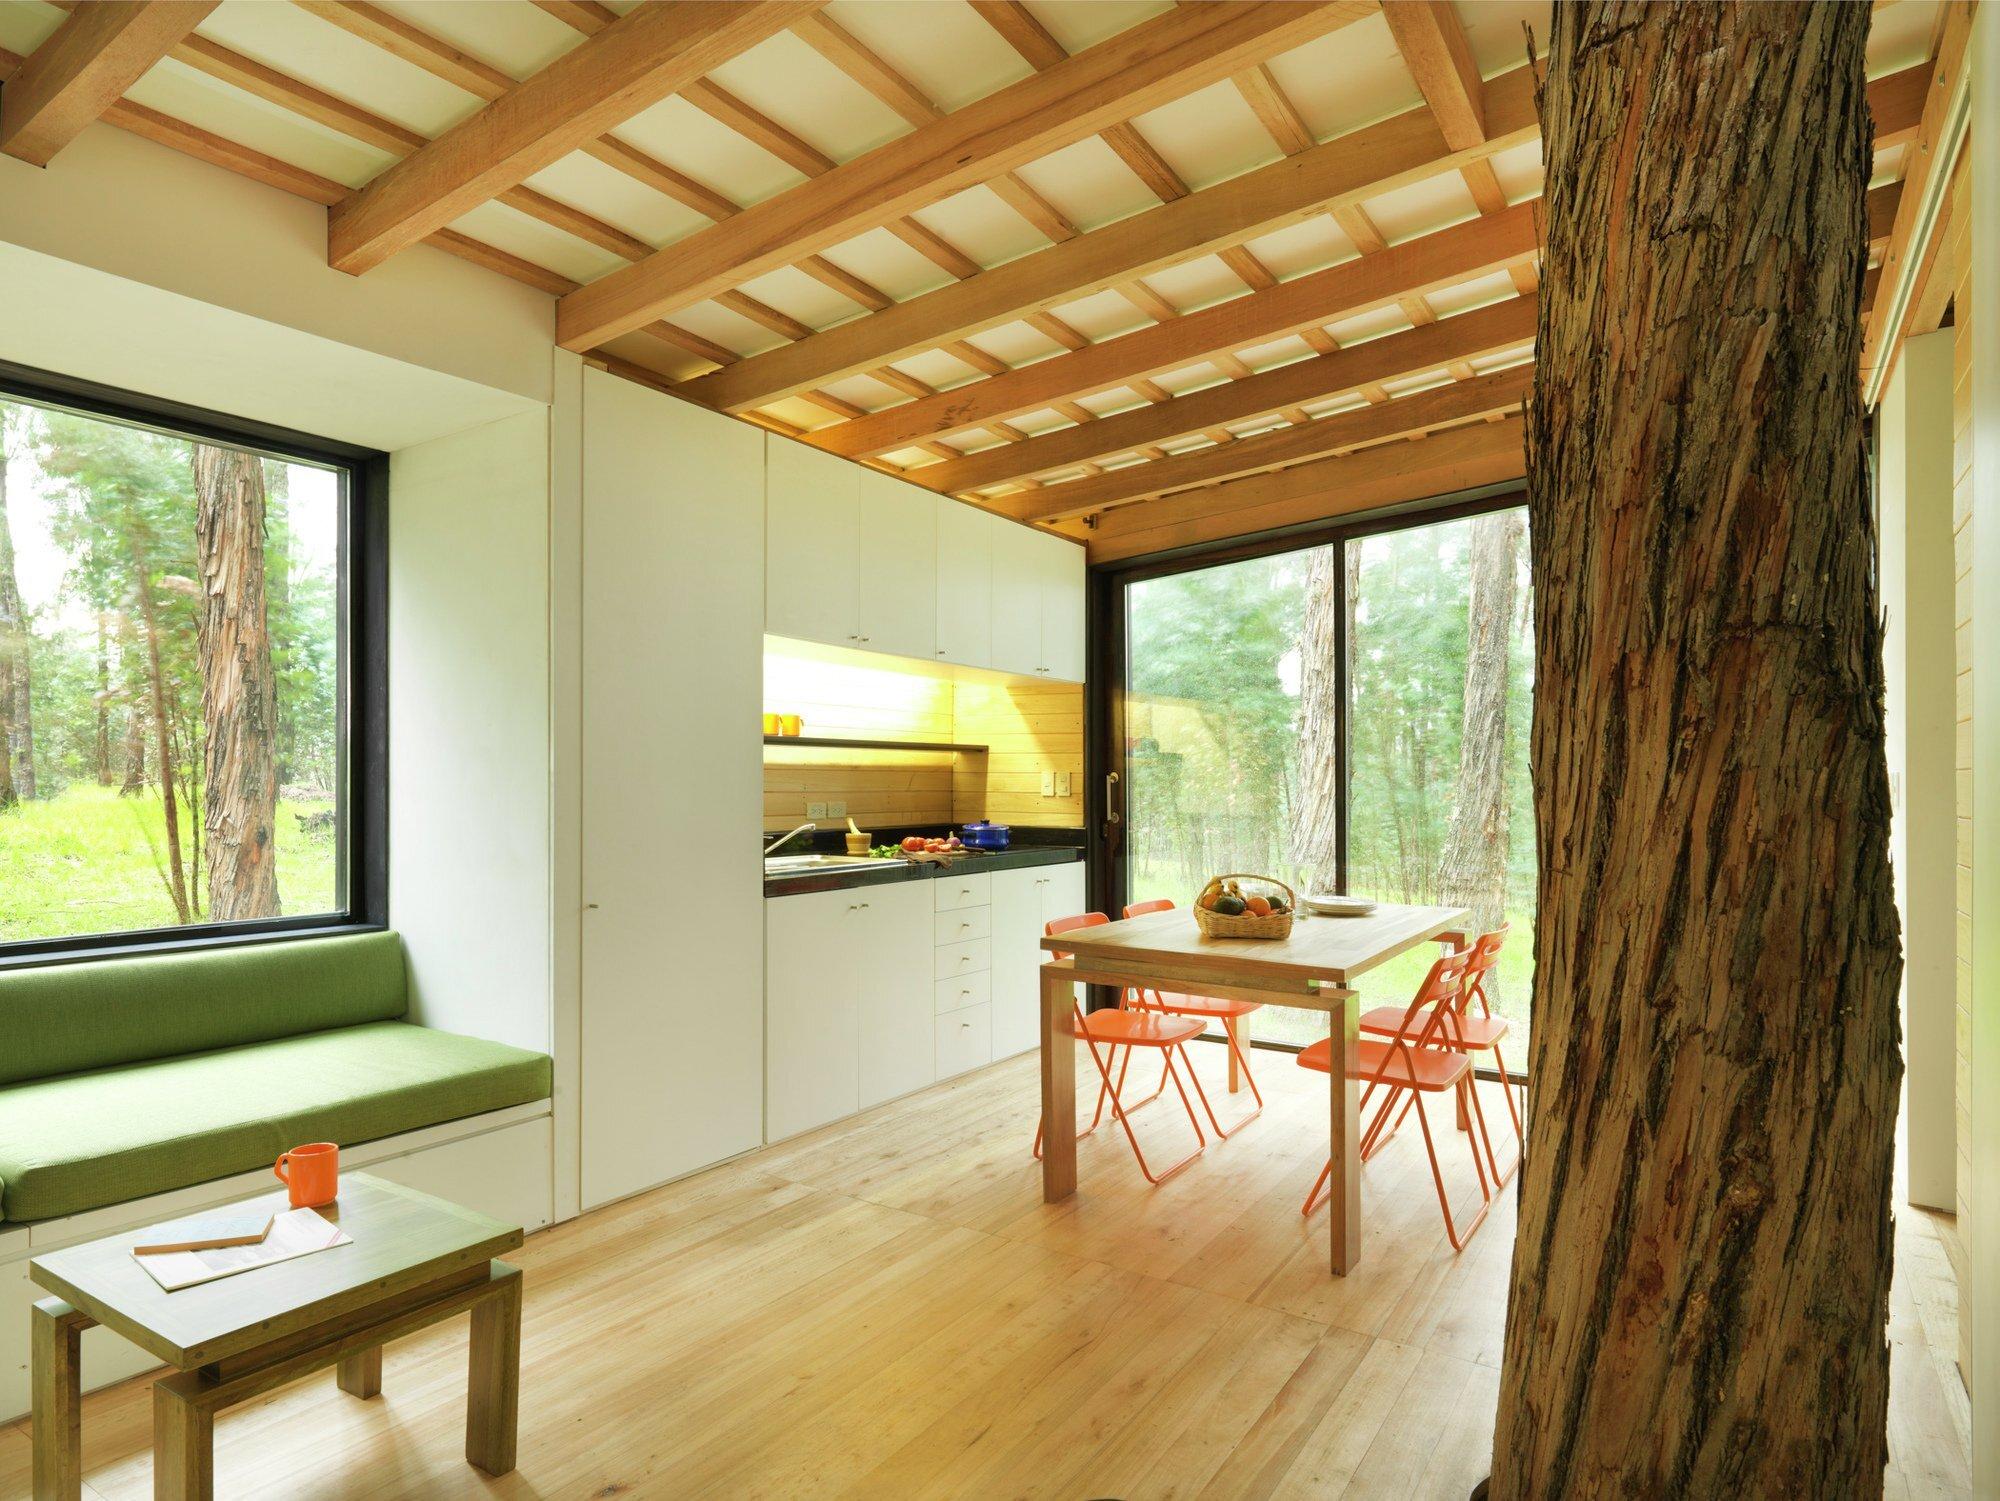 House Prototype - Luis Roldan Velasco + Ángel Hevia Antuña - Ecuador - Kitchen - Humble Homes